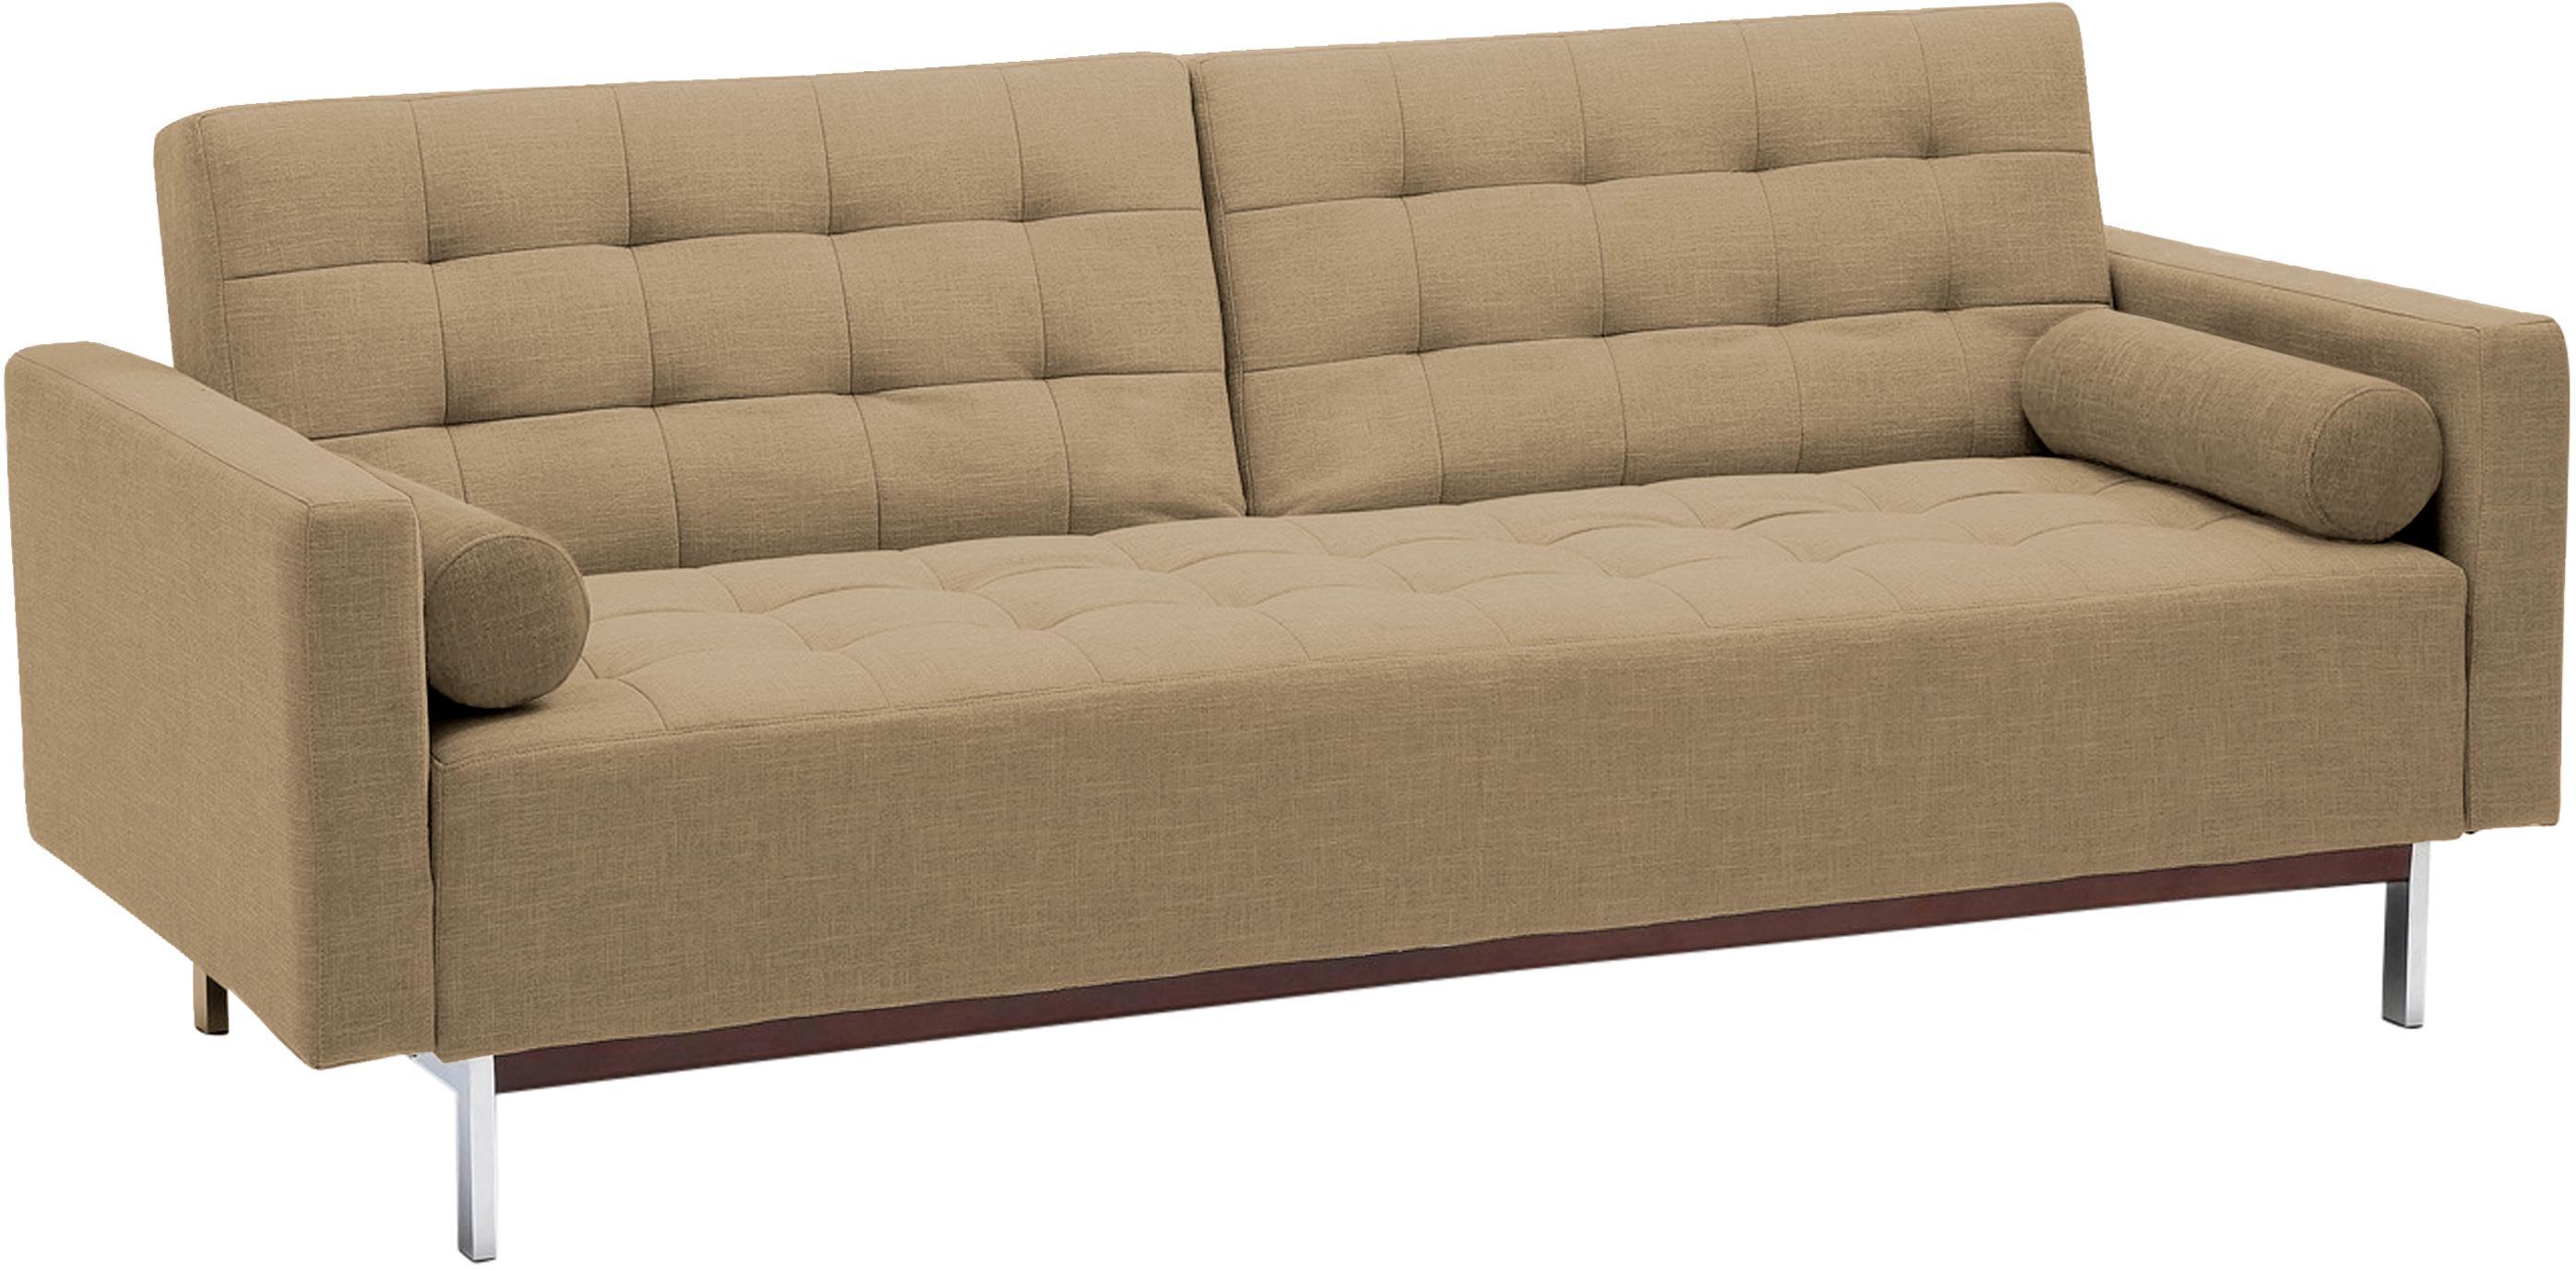 Gordon tufted sofa blue leather traditional sofas gordon for Traditional tufted leather sofa